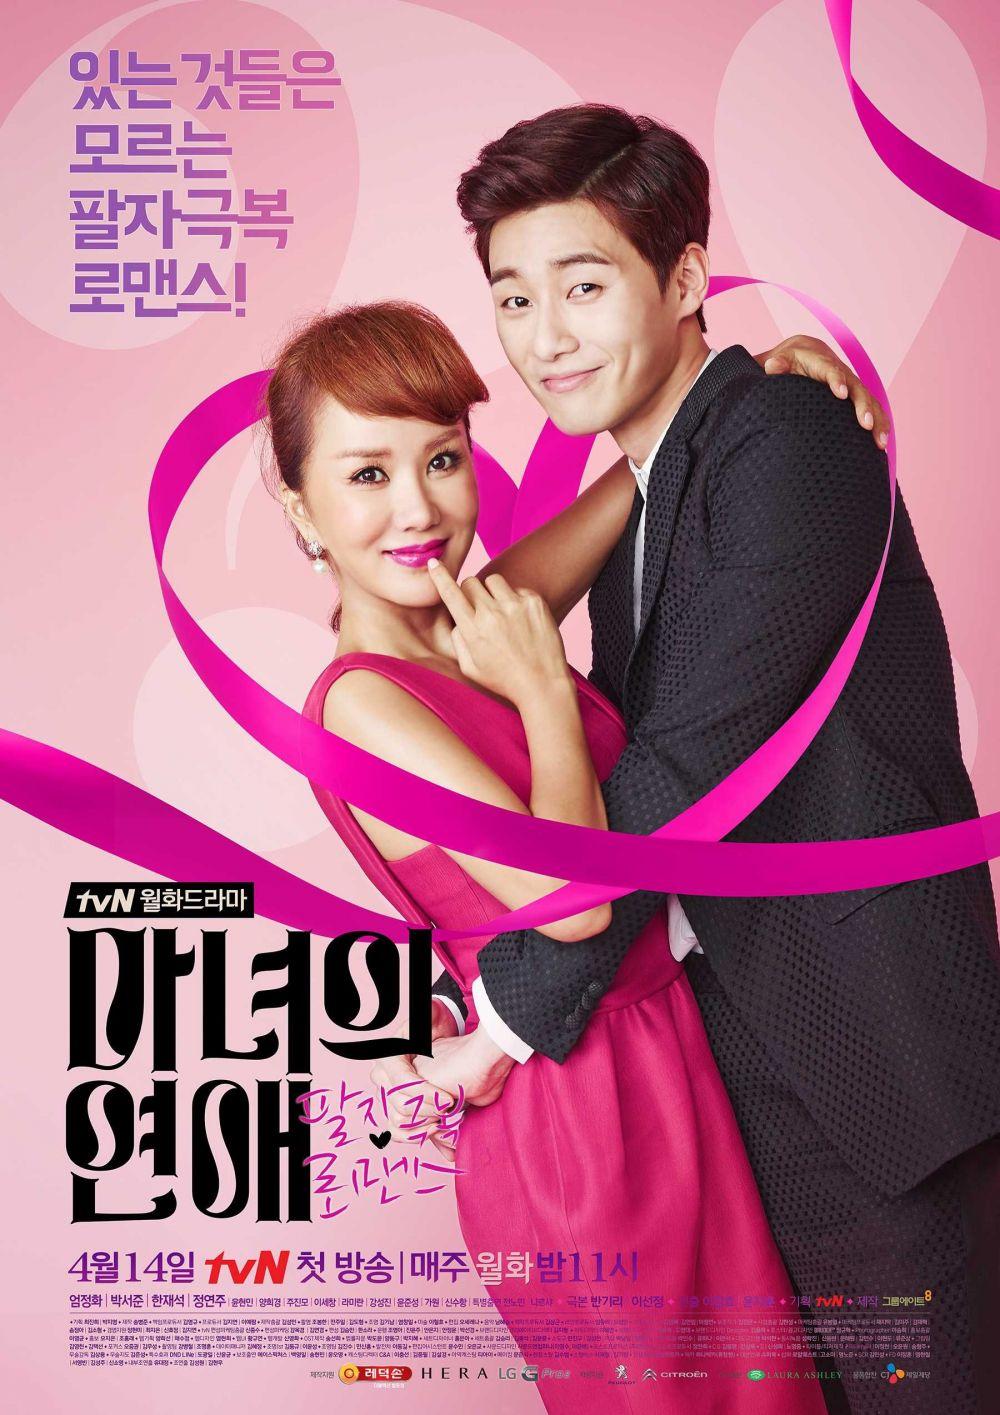 Drama Korea Park Seo-joon © 2020 mydramalist.com